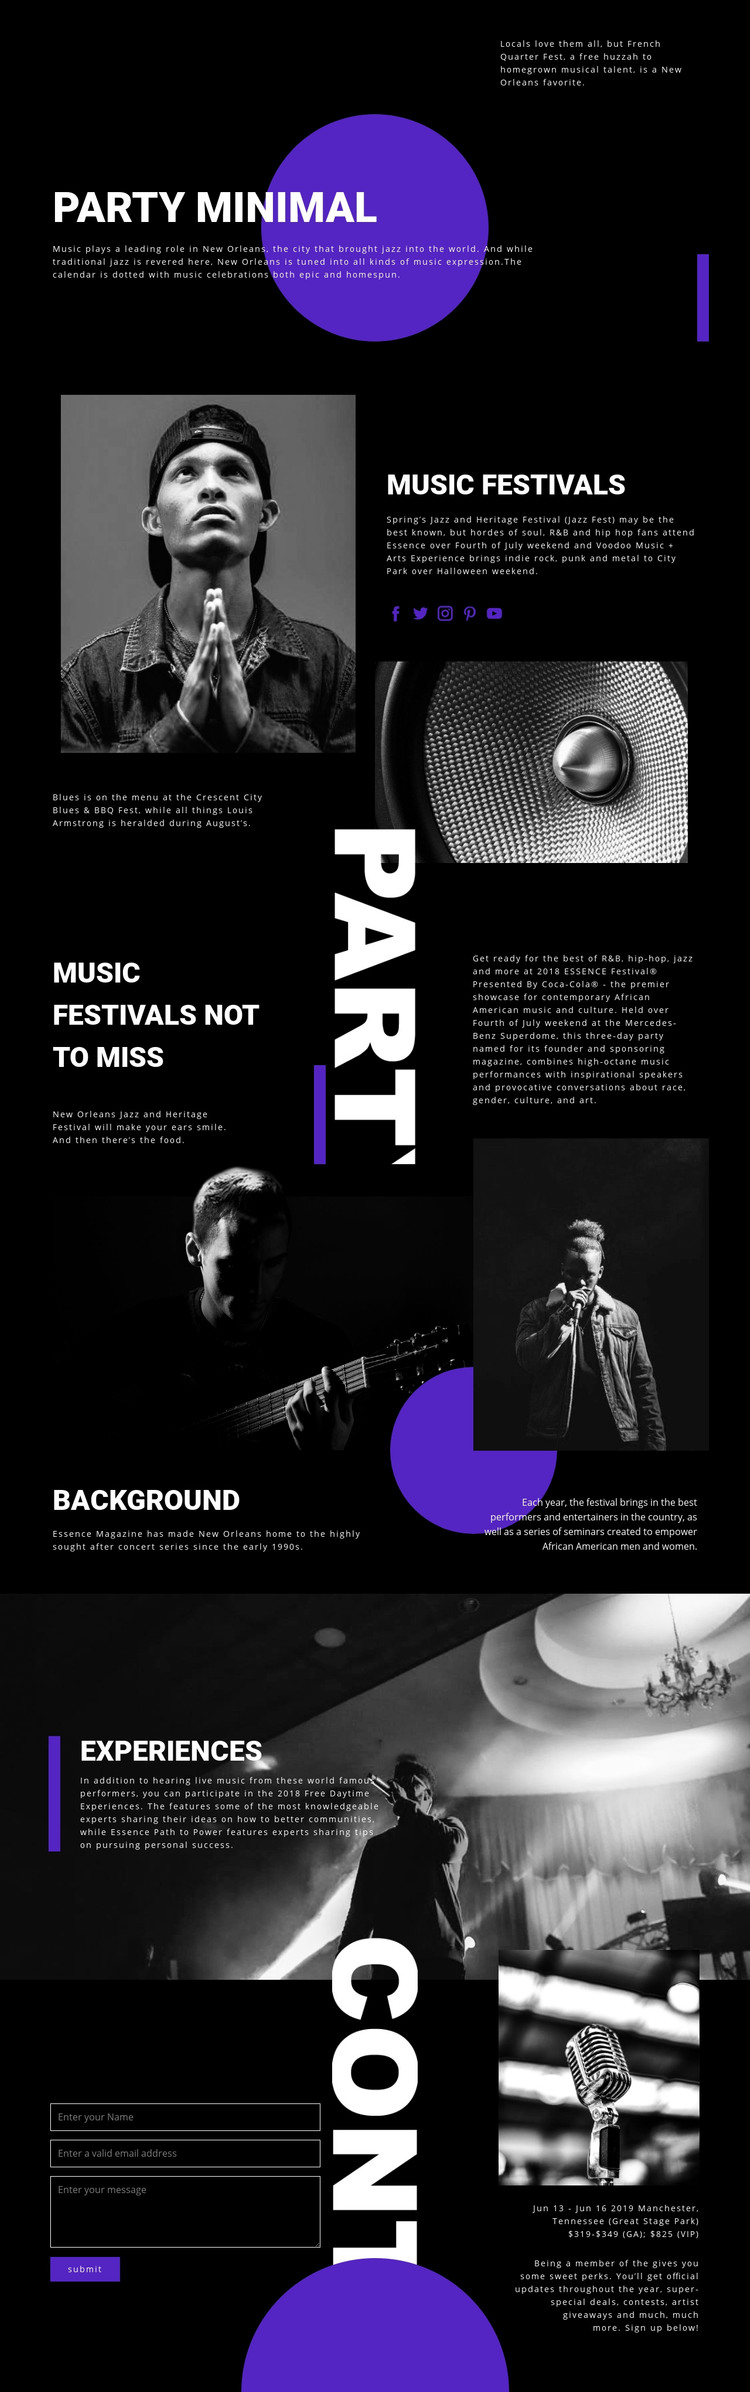 Music Festival Homepage Design